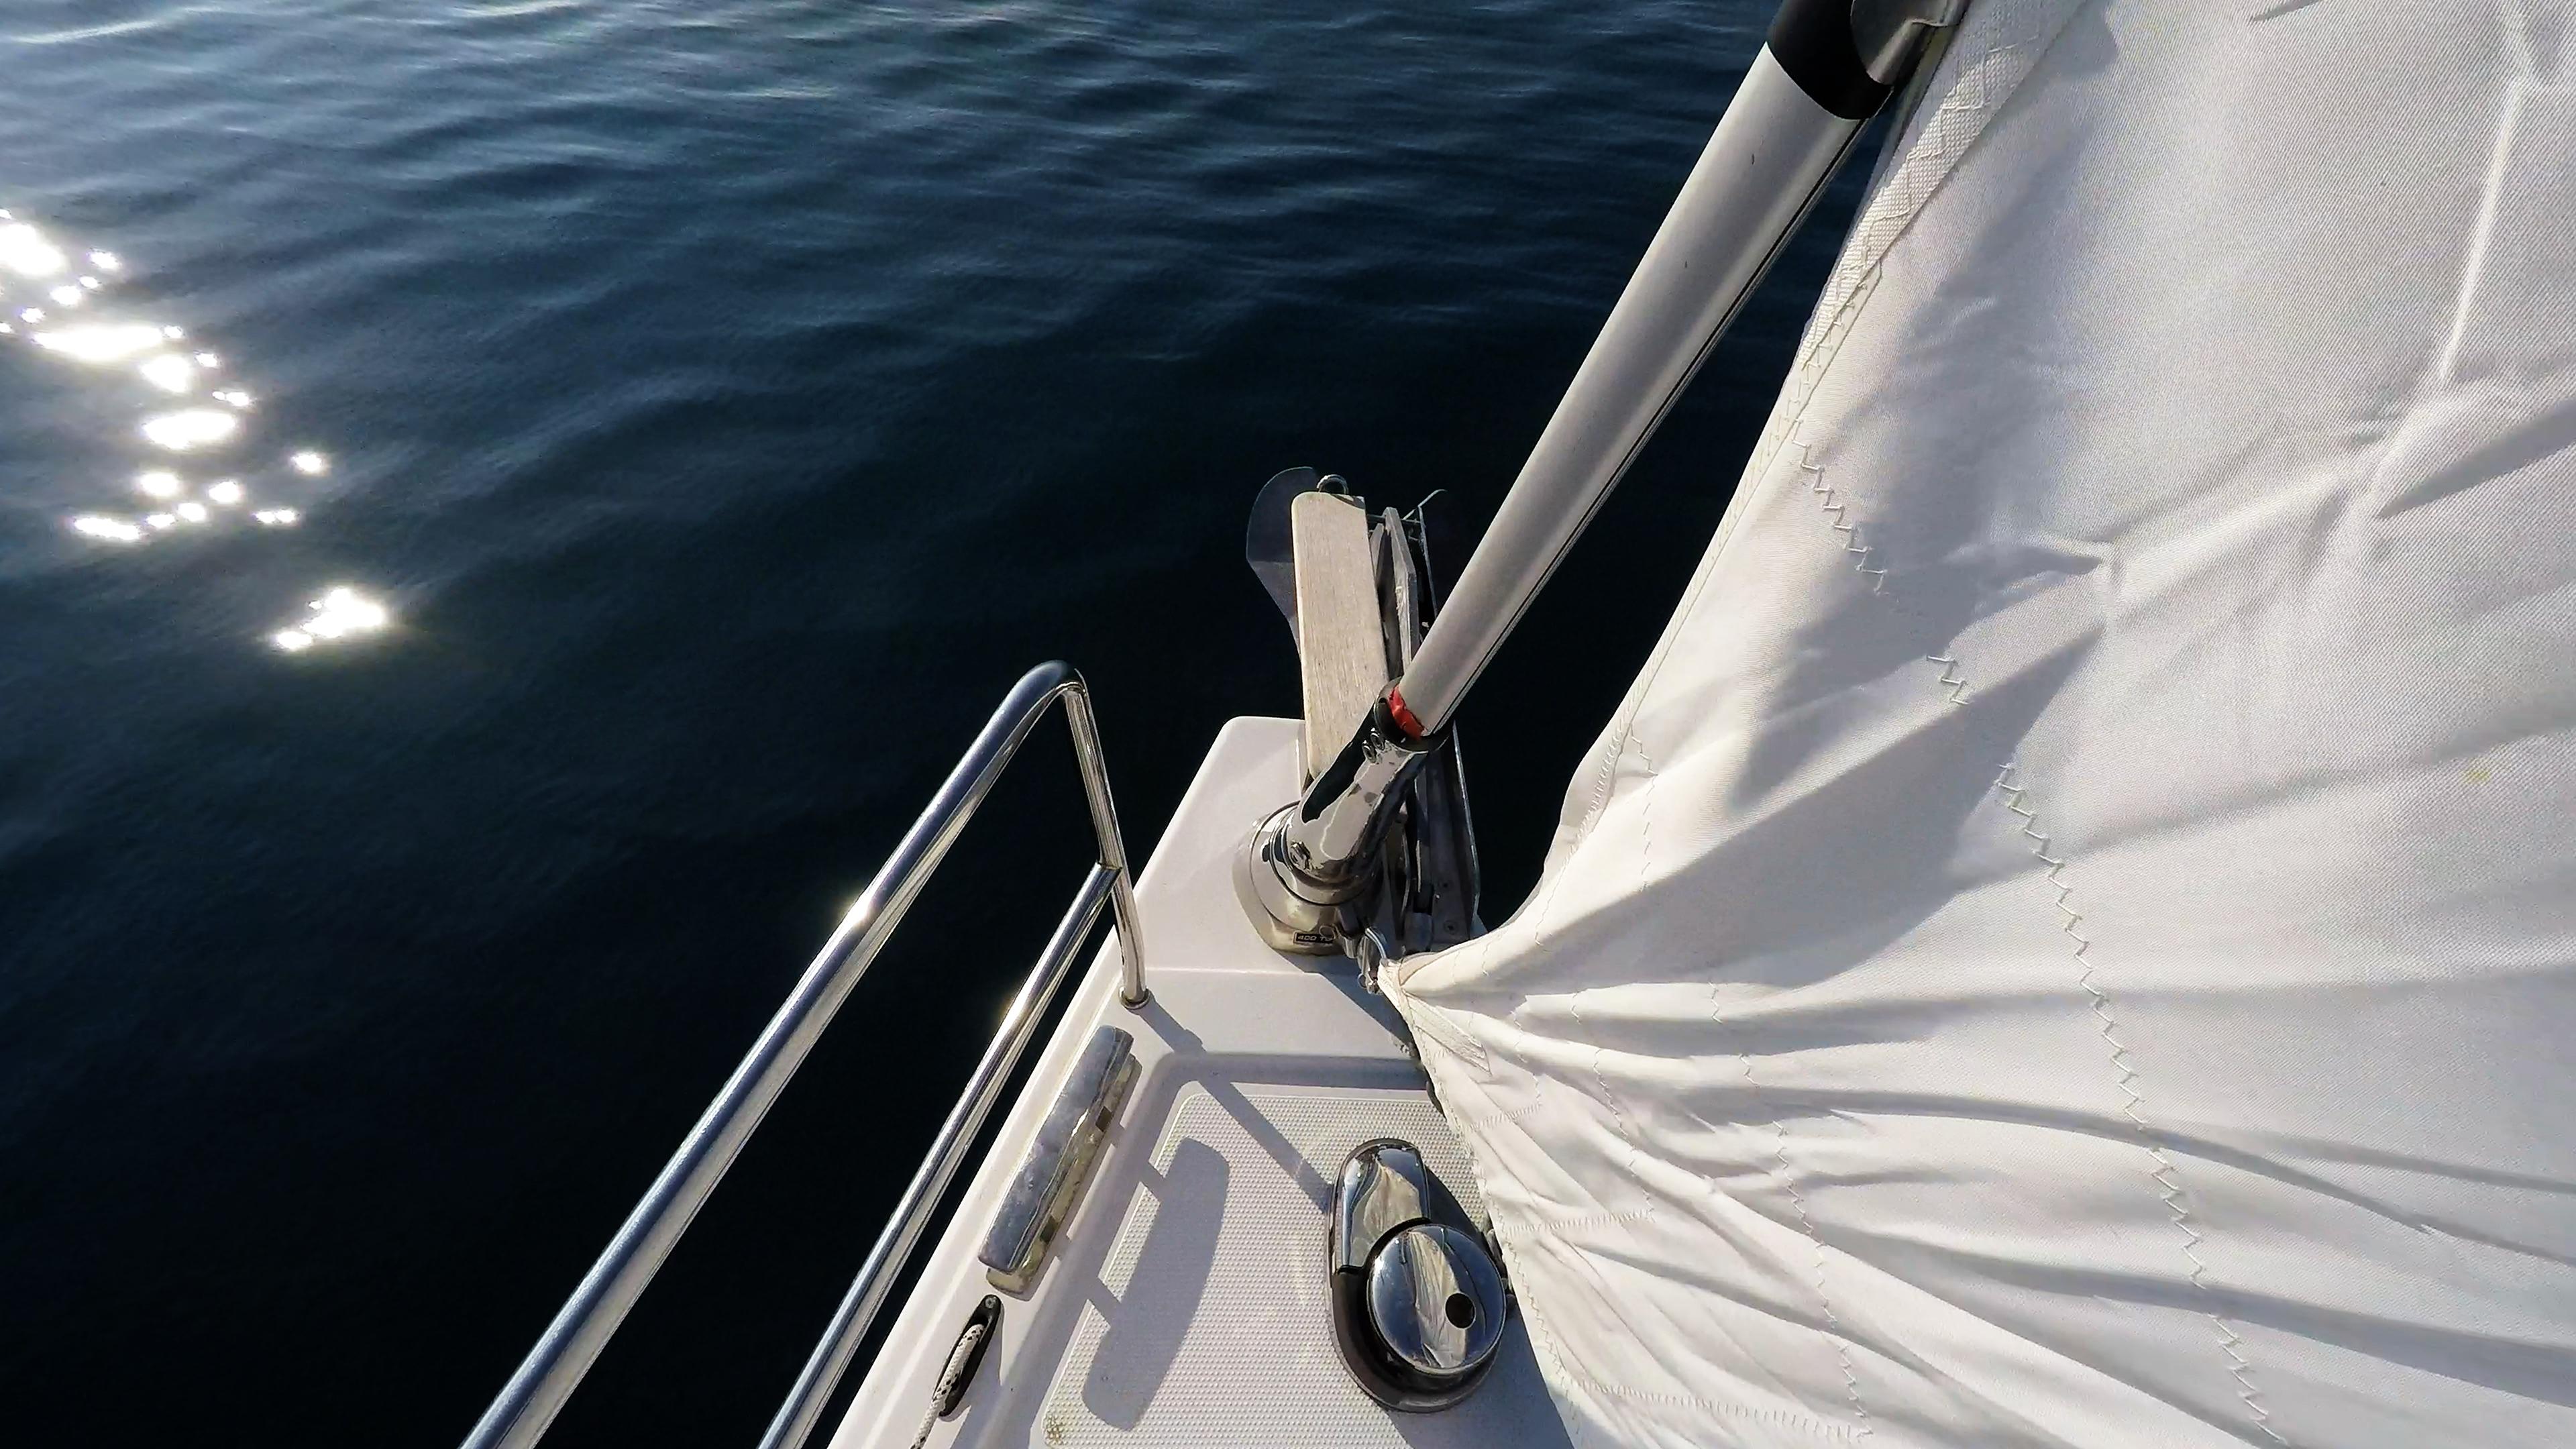 Segelyacht elektrische AnkerWinde Segelboot Segel Rollgenua Bug Meer Sonne